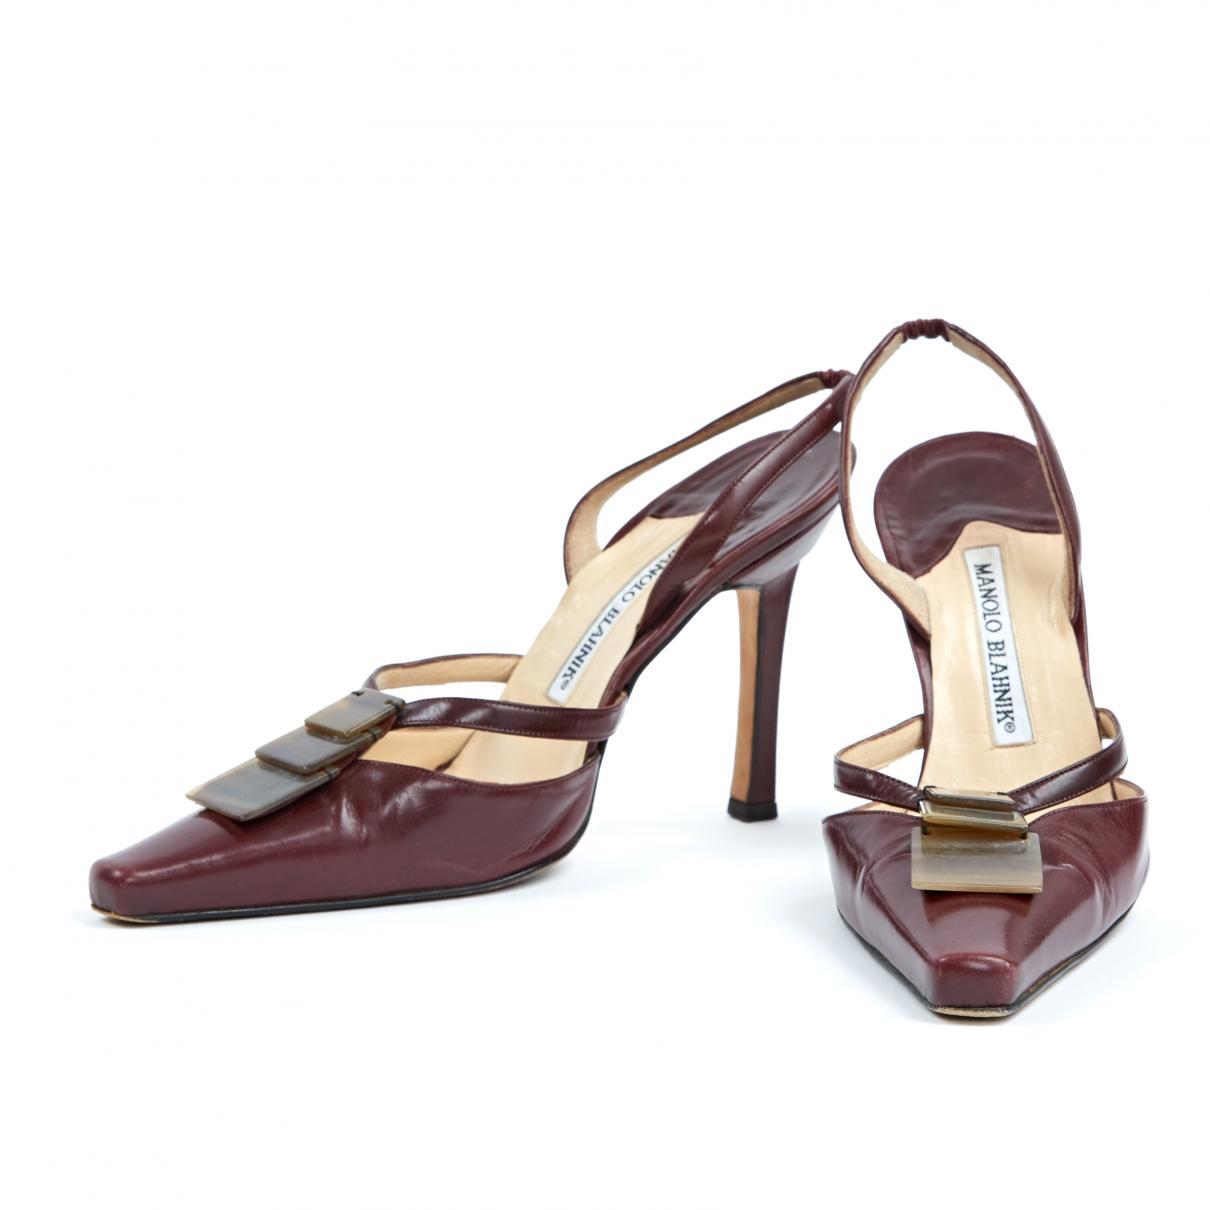 c158c63a0131b Lyst - Manolo Blahnik Burgundy Leather Sandals